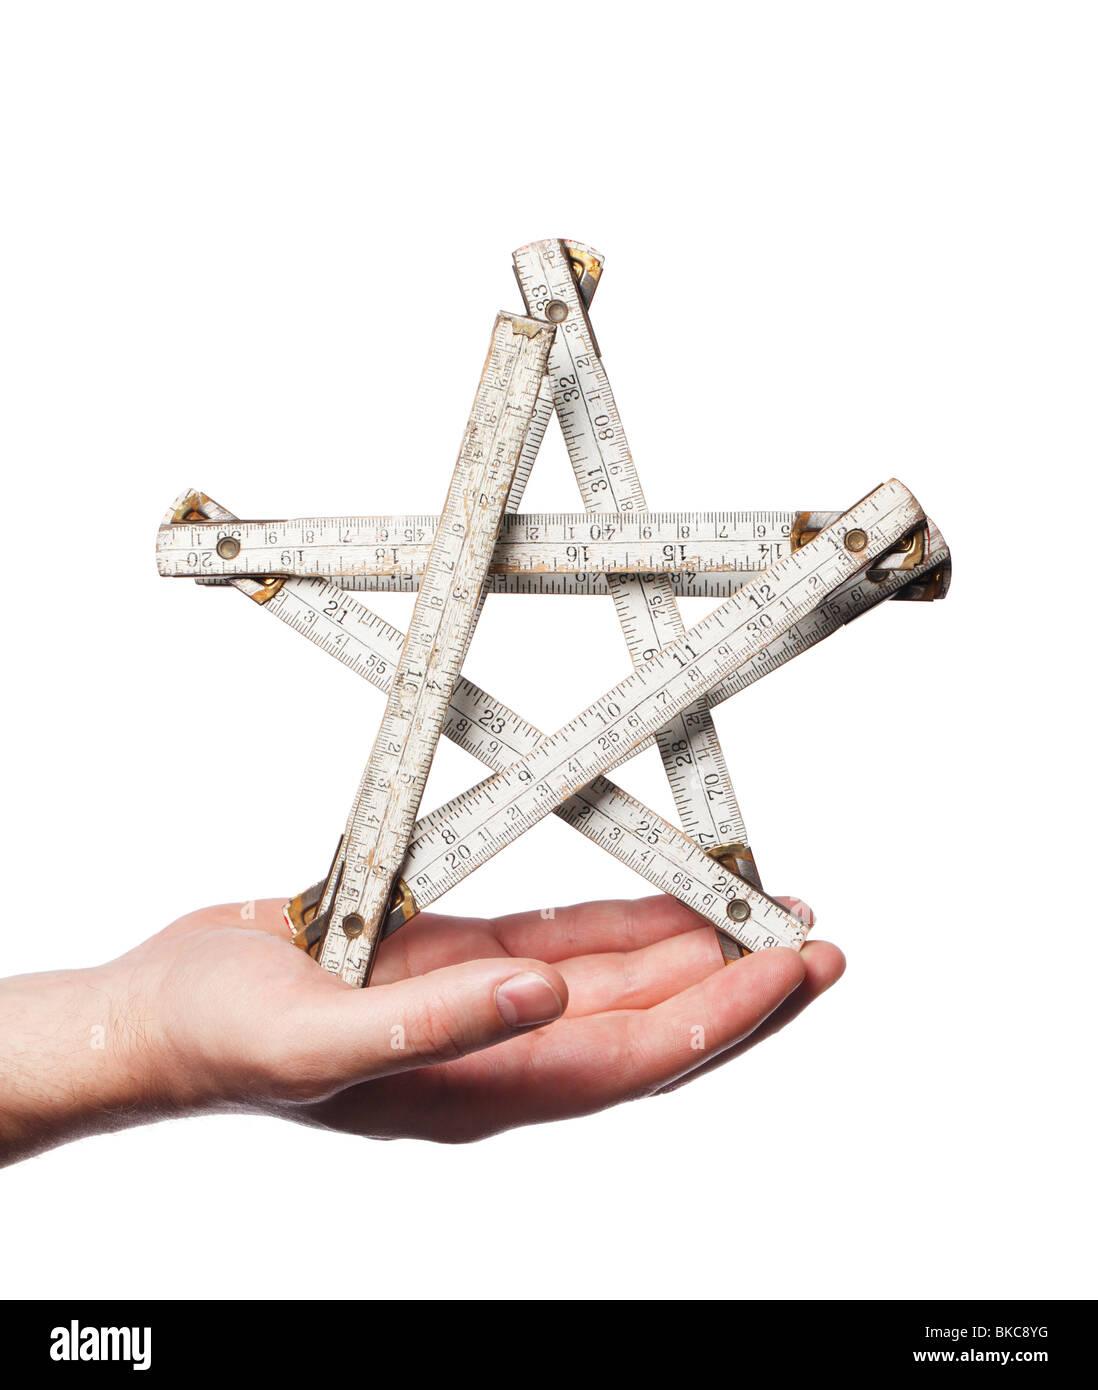 Folding carpenter ruler as a star - Stock Image